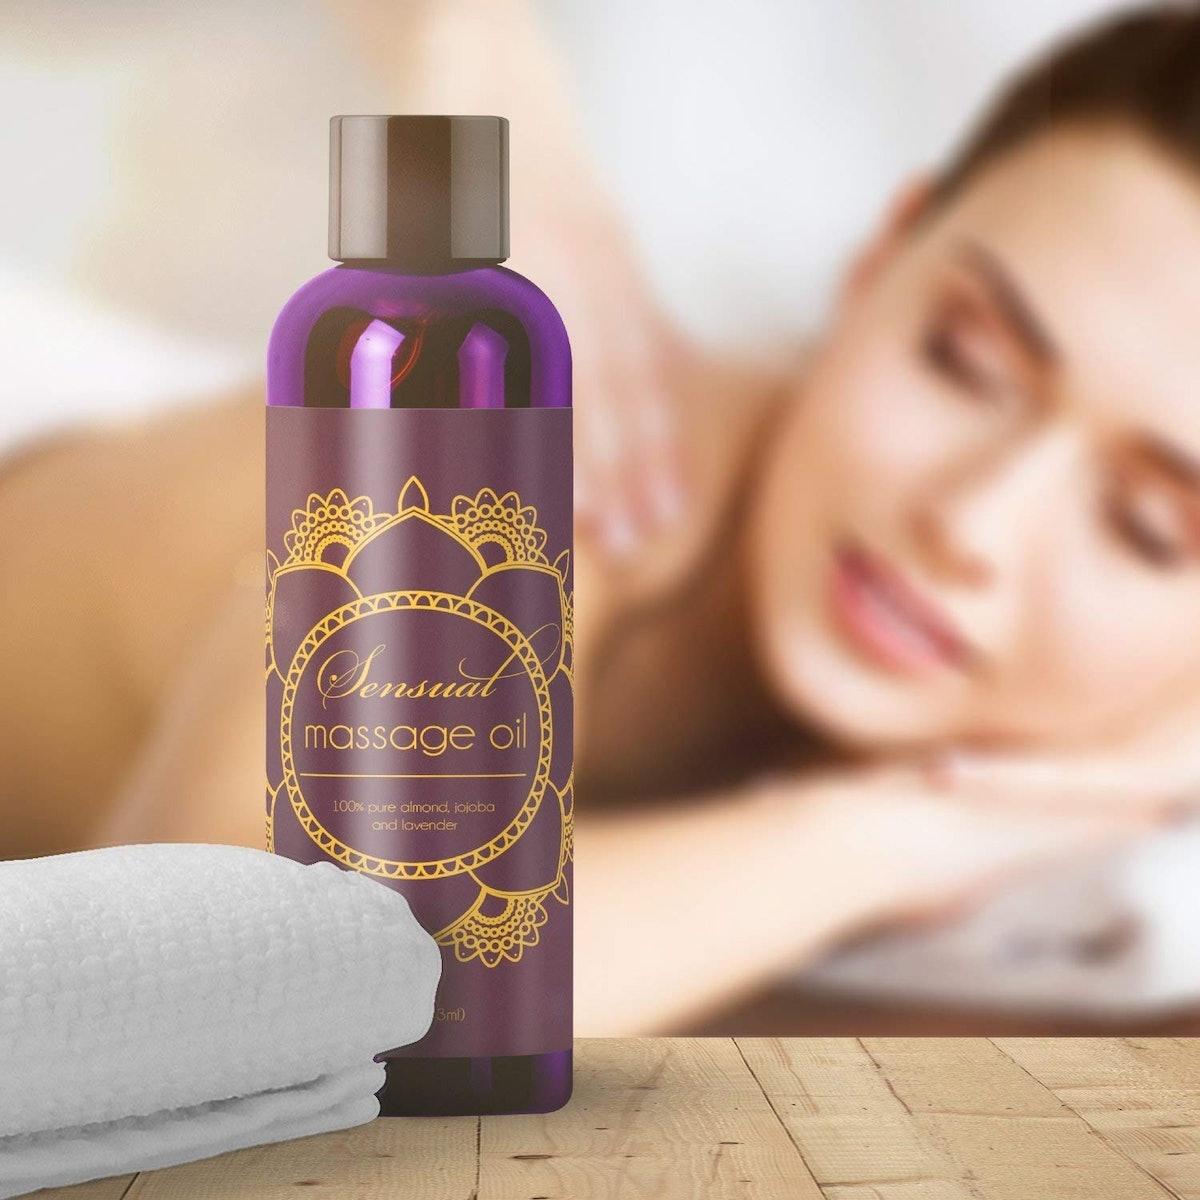 Honeydew Sensual Massage Oil